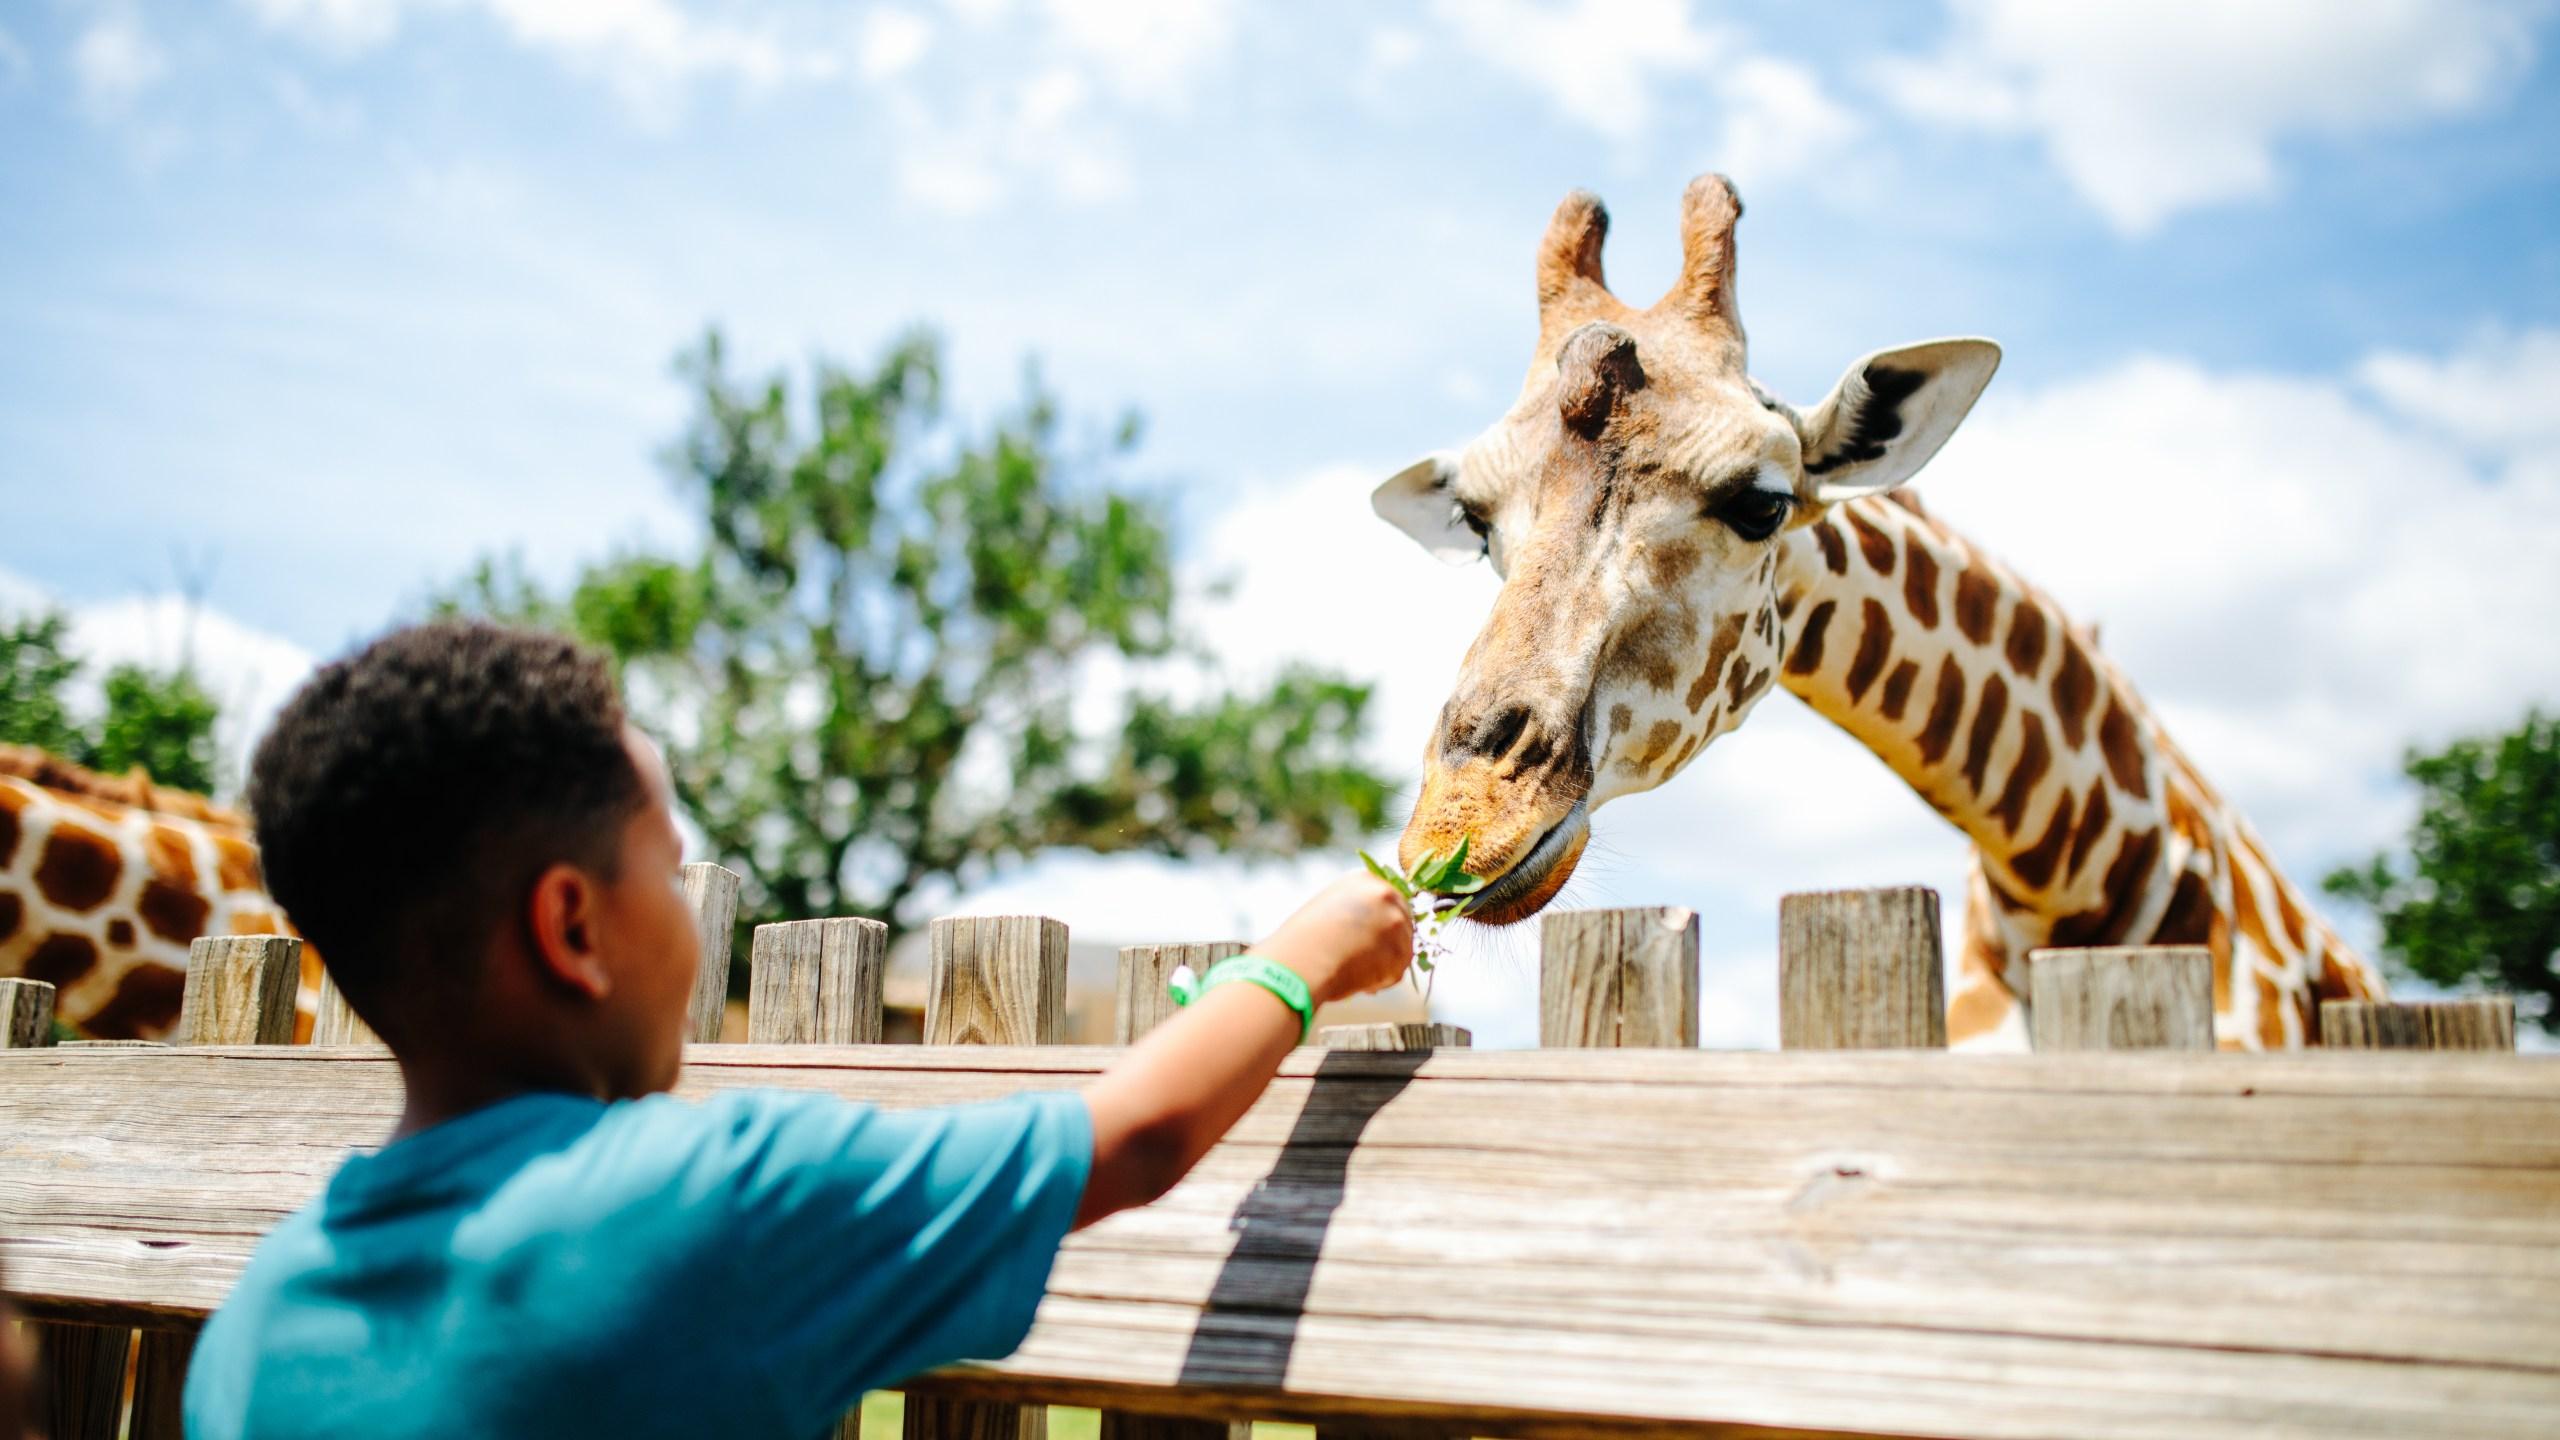 Giraffe Feeding at the OKC Zoo